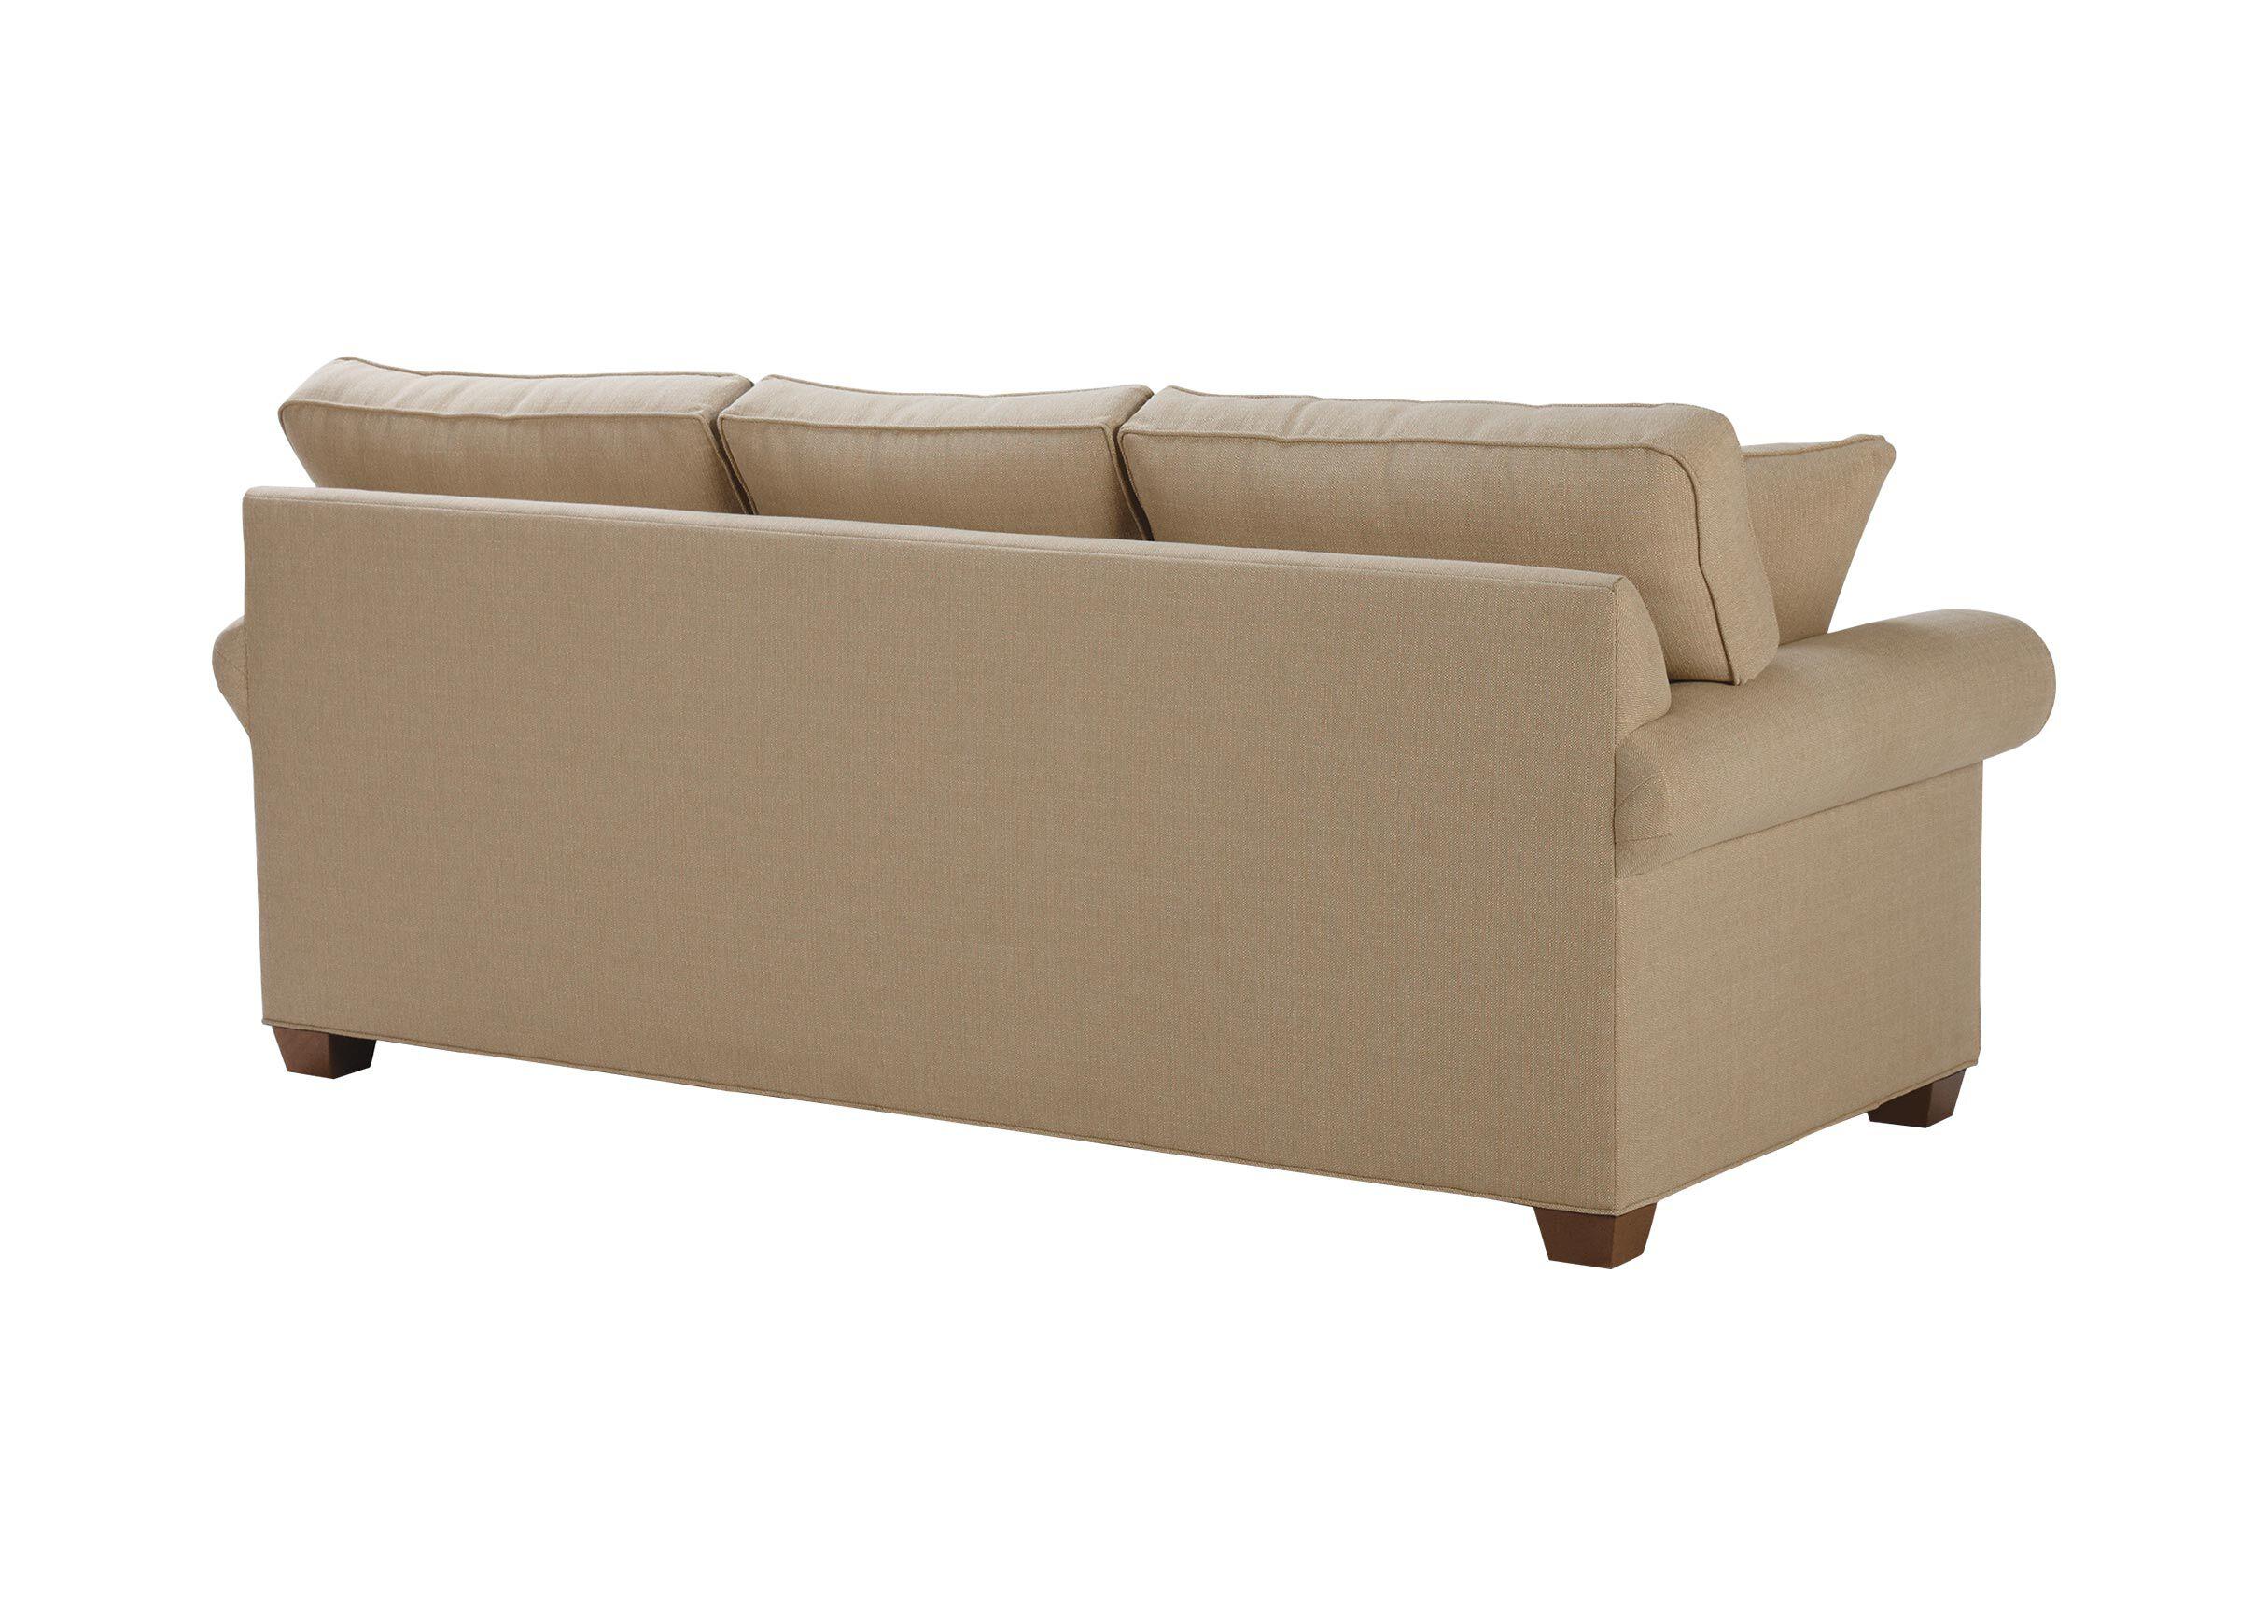 roll arm sofa canada fabric sofas with nailhead trim bennett loveseat ethan allen